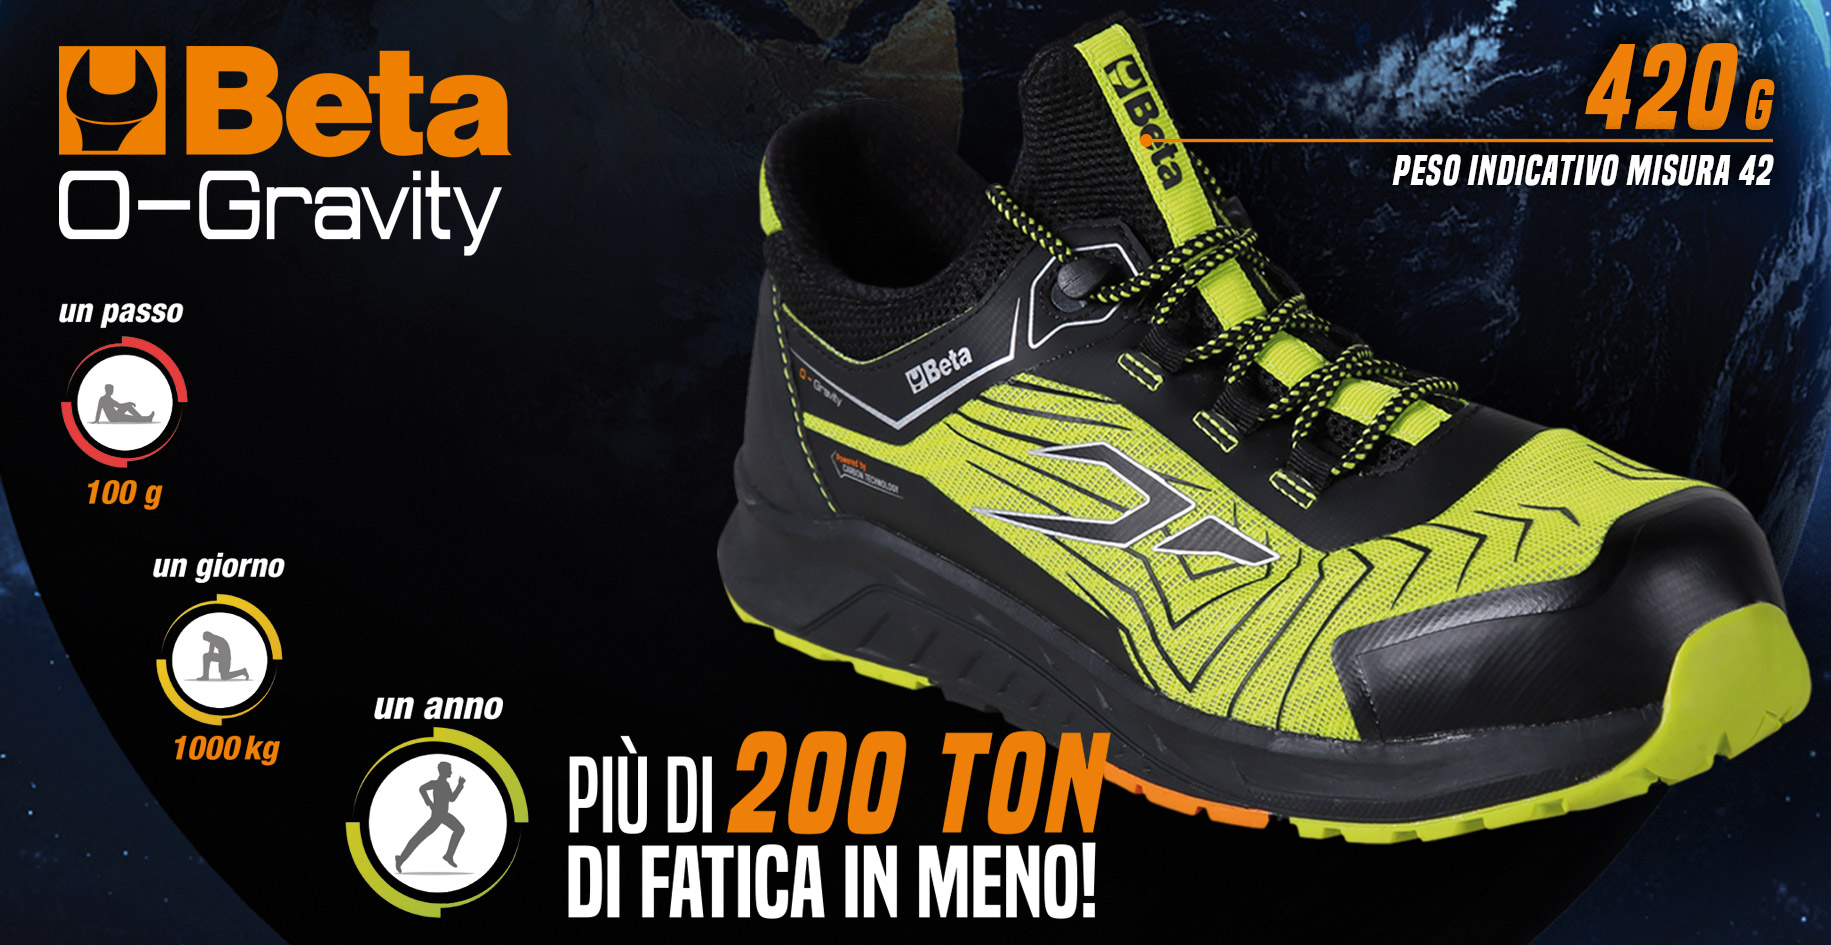 scarpe antinfortunistica O-Gravity beta